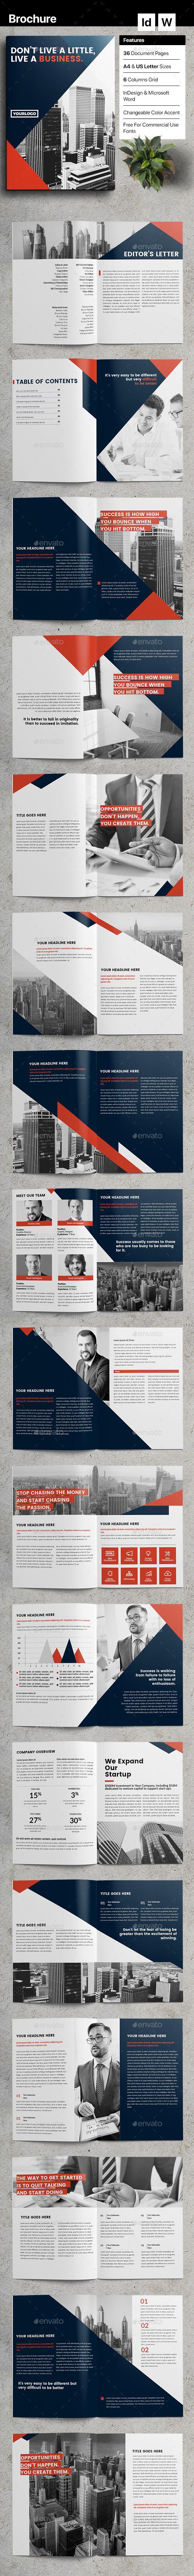 Business Brochure - Corporate Brochures Download here: https://graphicriver.net/item/business-brochure/19979008?https://graphicriver.net/item/brochure/19866474?ref=classicdesignp